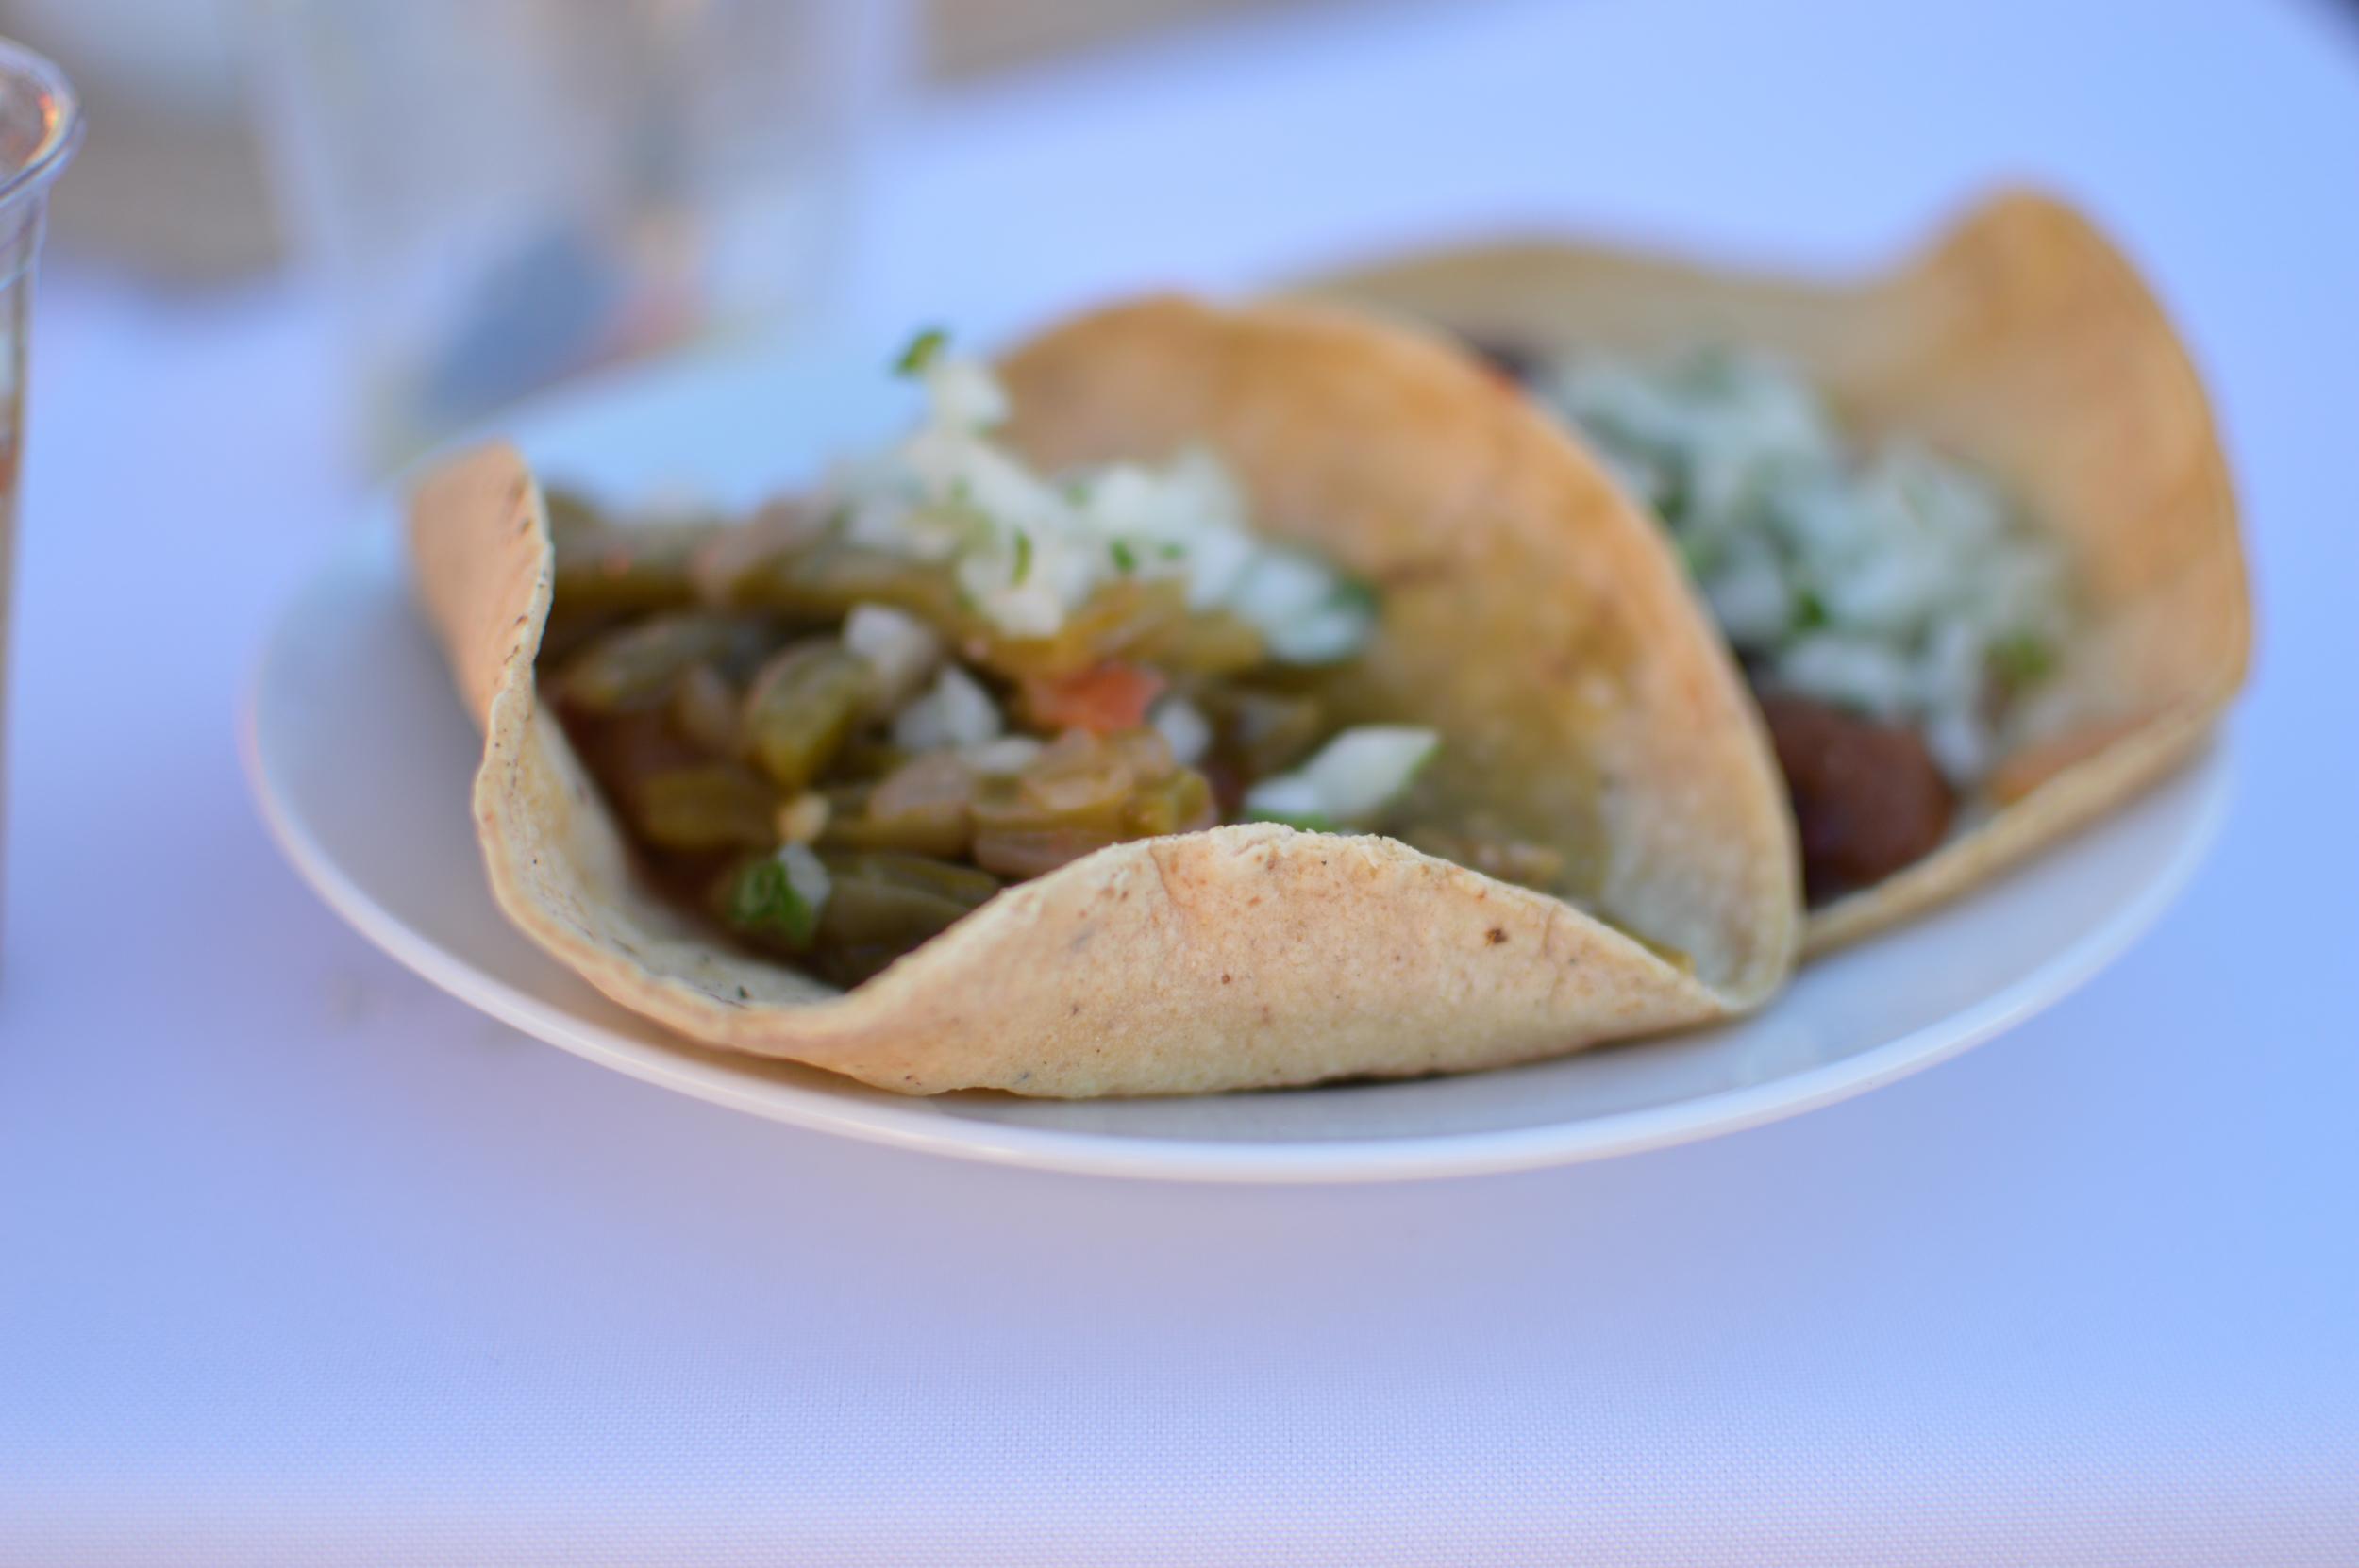 Gourmet tacos with nopales (cactus) and jamaica (hibiscus)